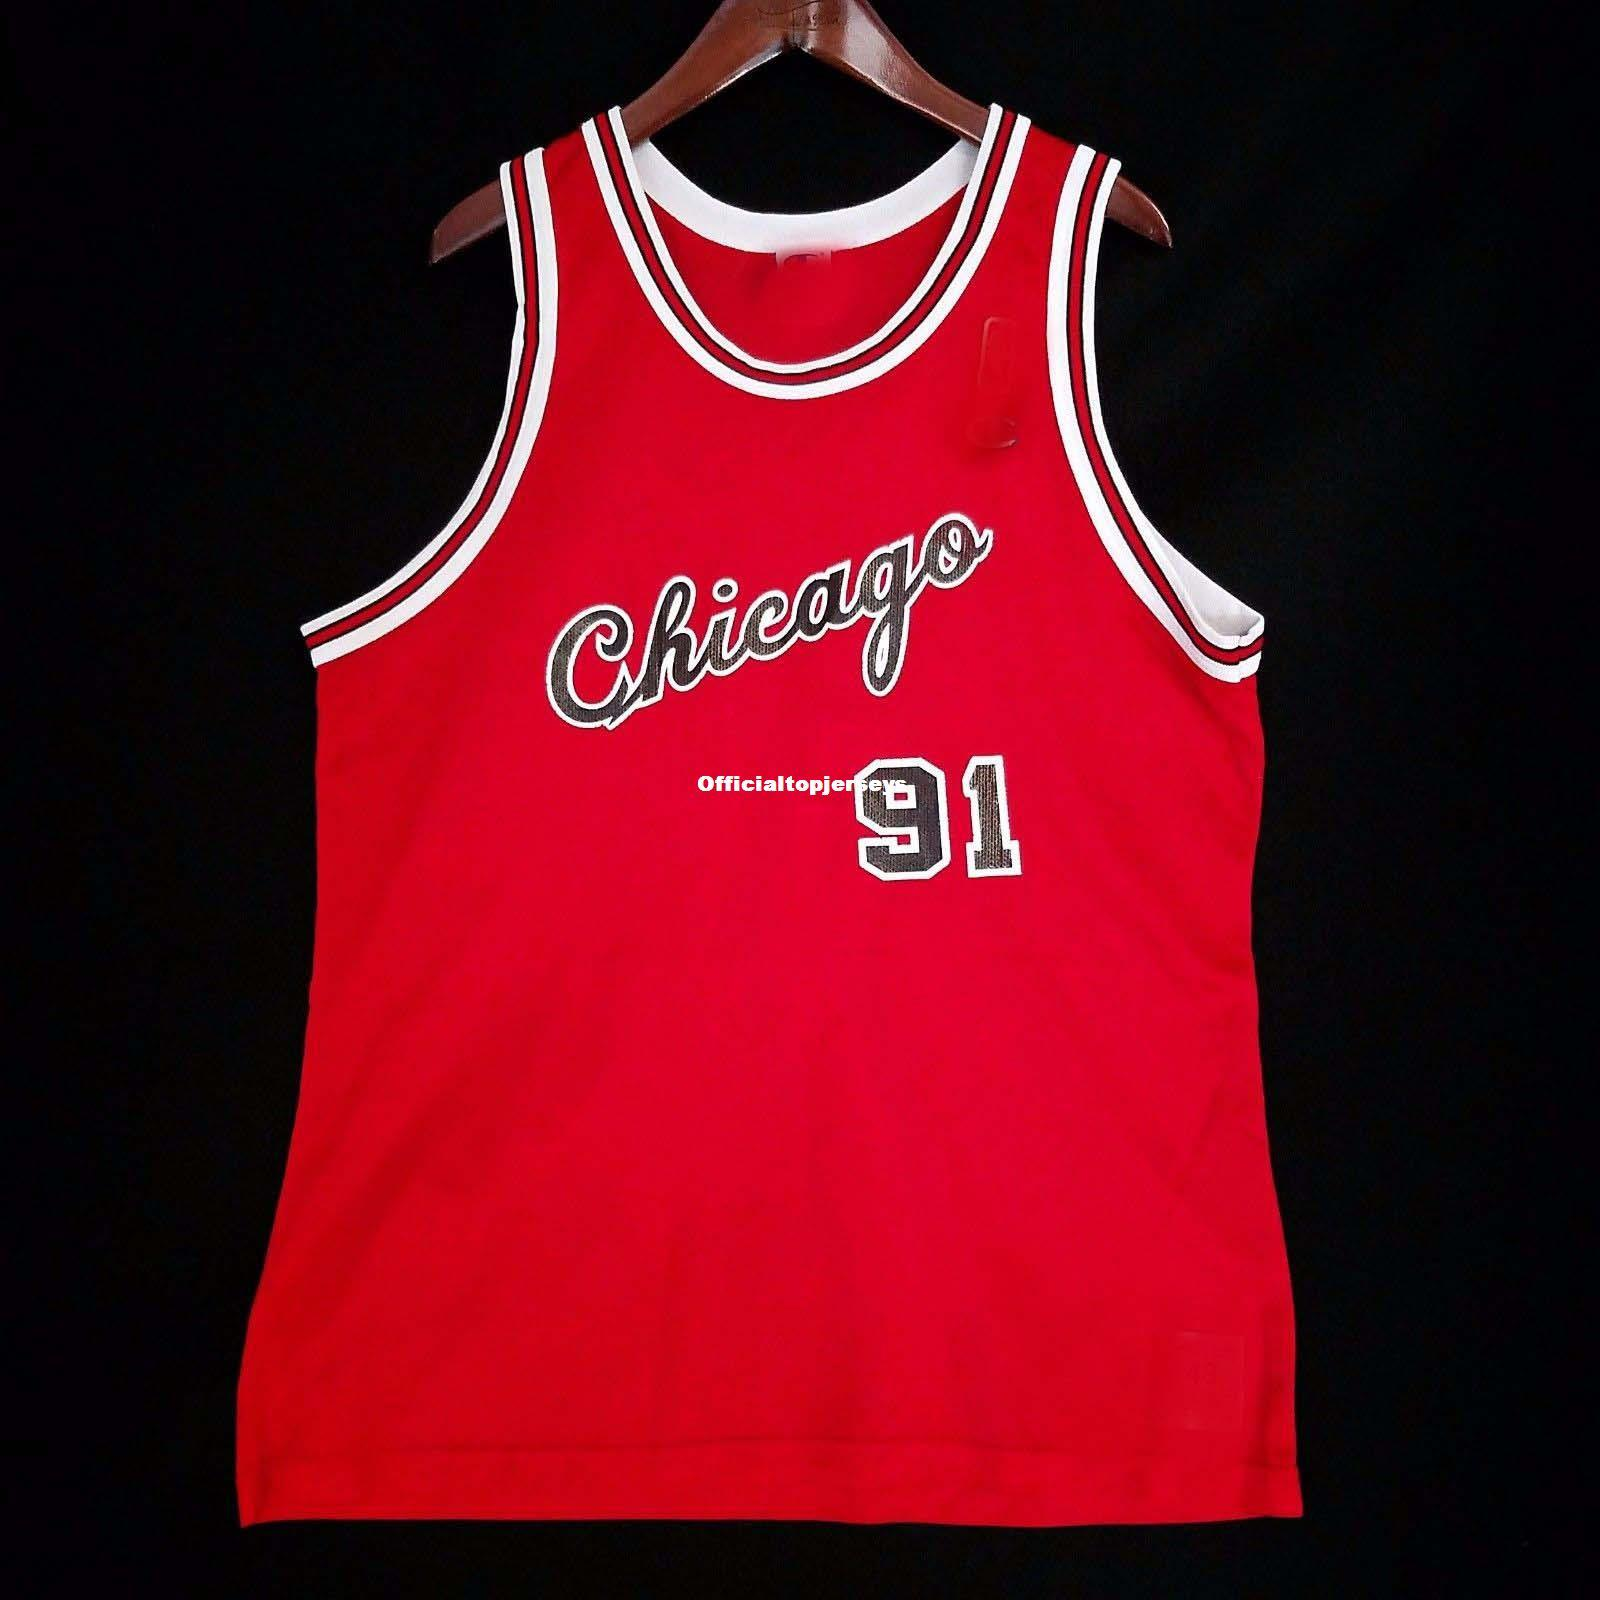 superior quality 6c545 520d5 Dennis Rodman #91 Champion Wholesale 50th Jersey Mens Vest Size XS-6XL  Stitched basketball Jerseys Ncaa